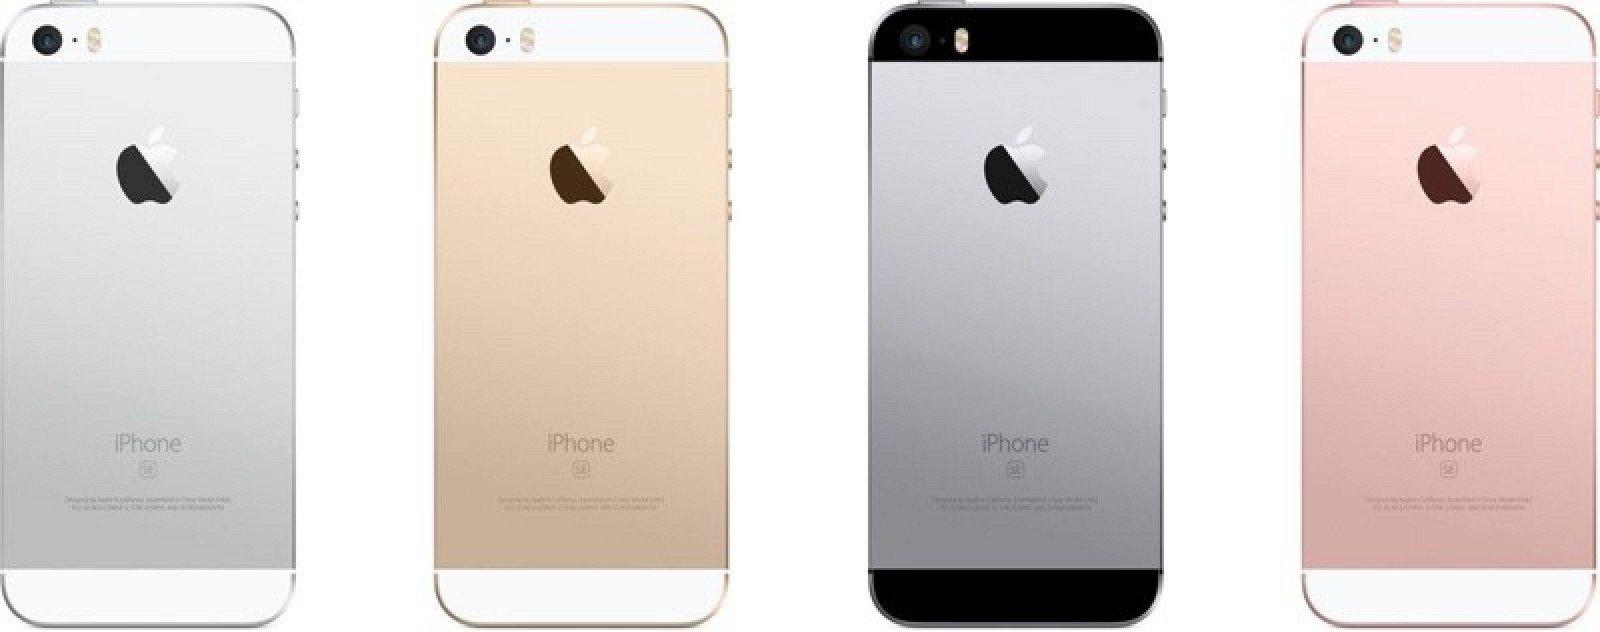 iphoneseback-800x316